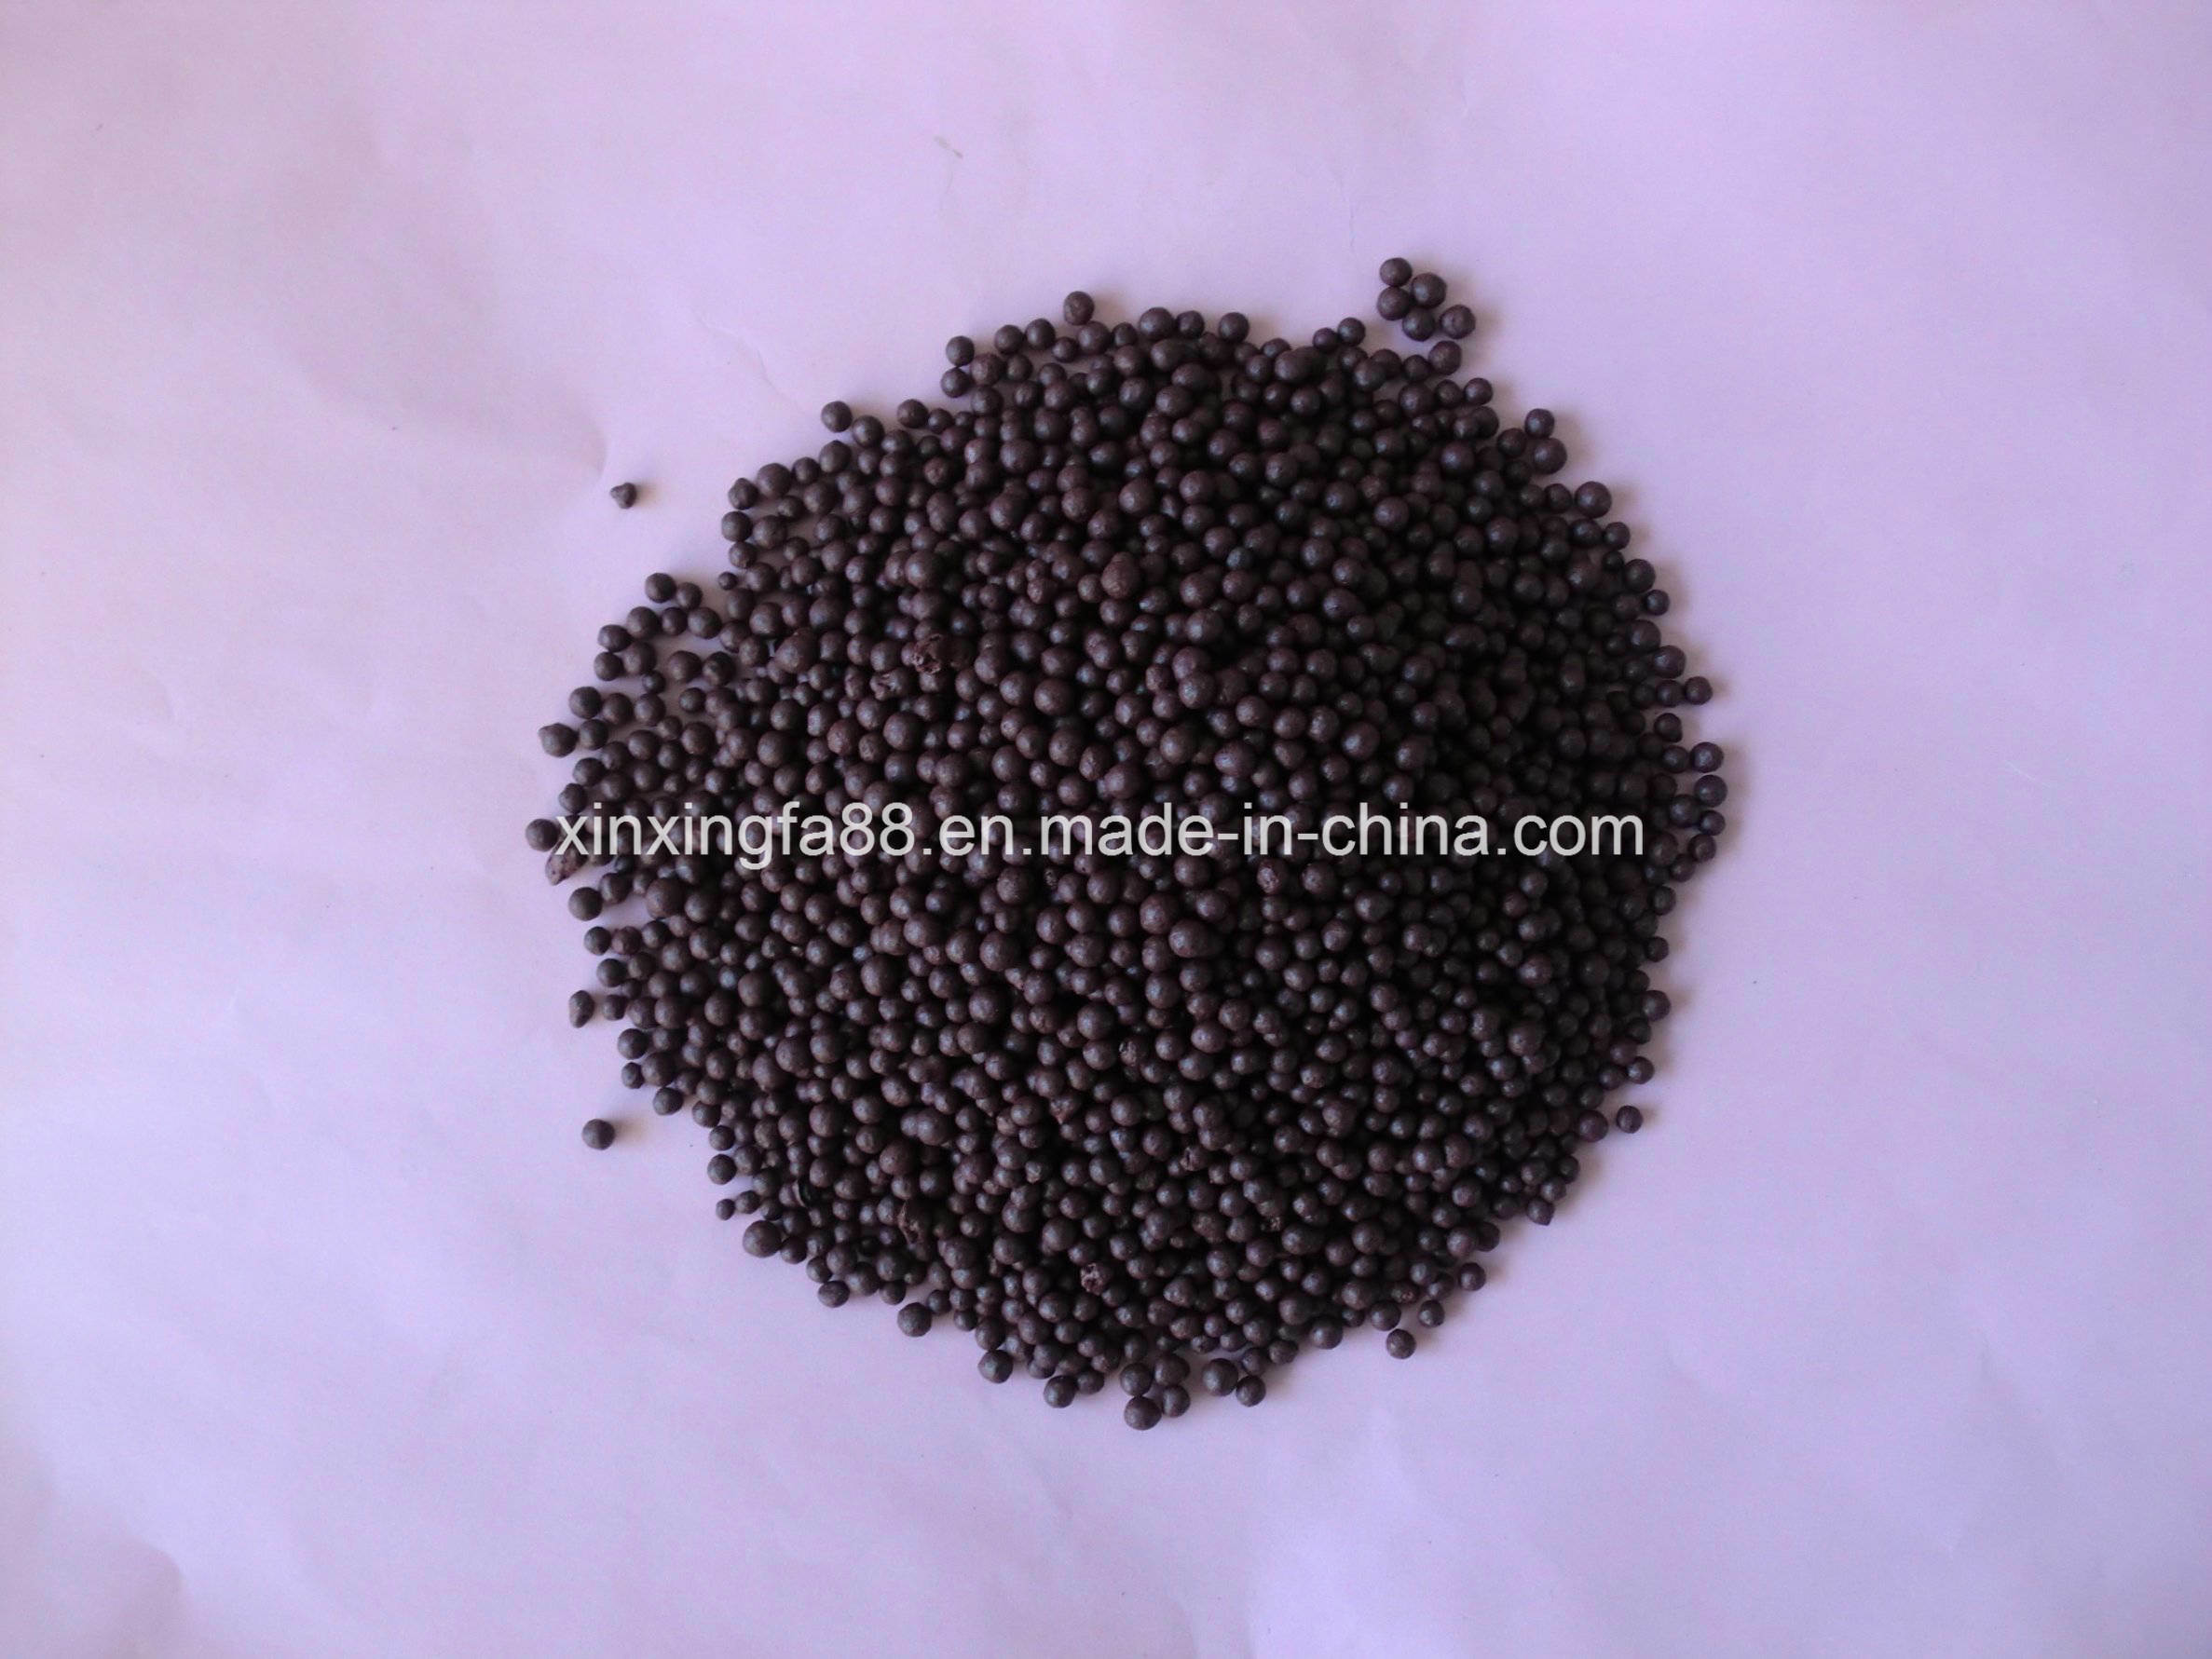 NPK Organic Fertilizer, Chemicals Compound Fertilizer